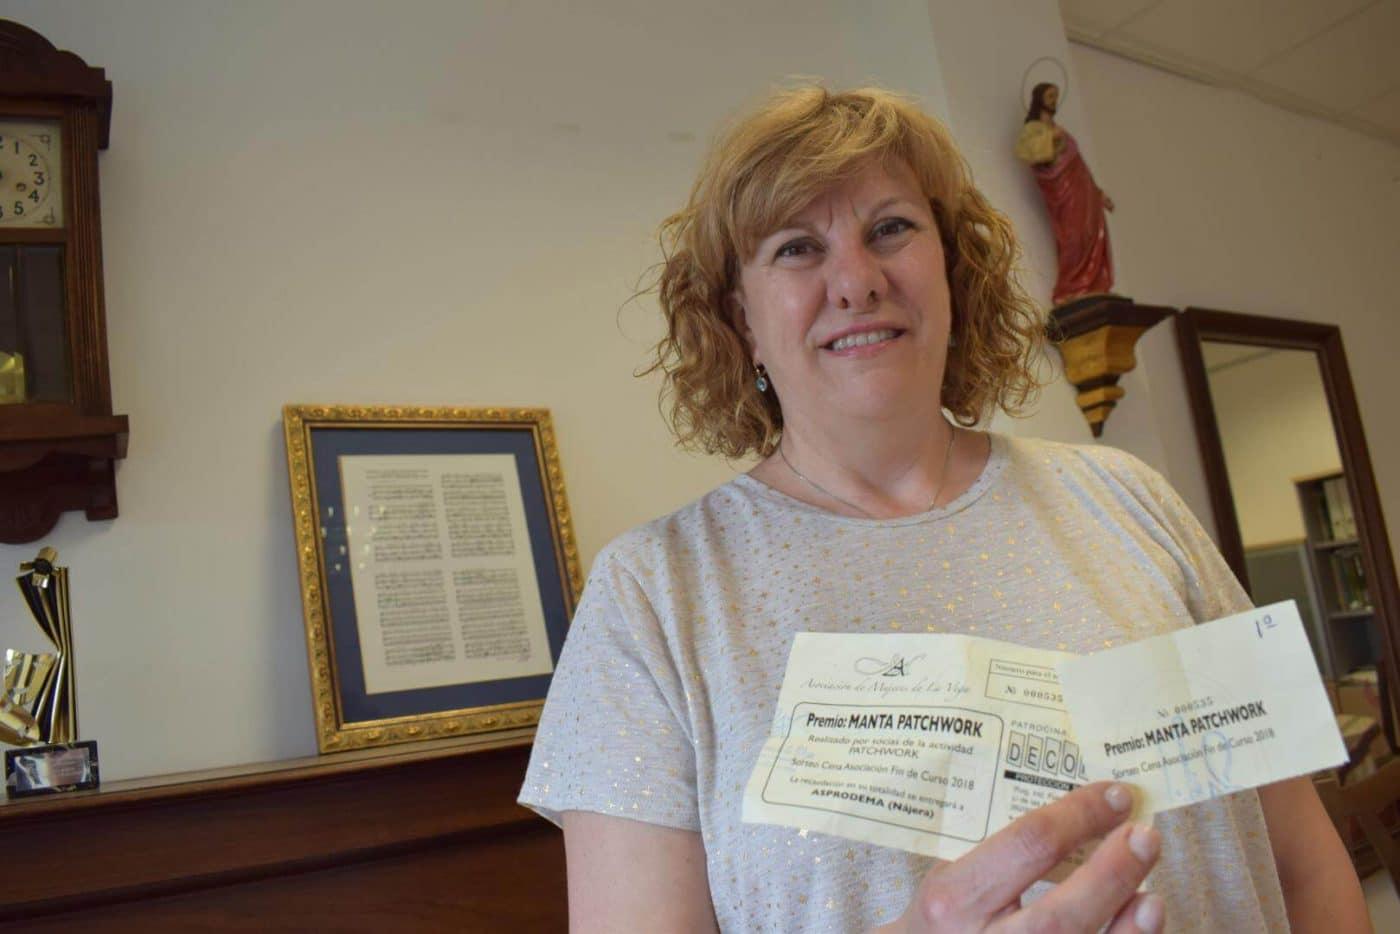 Las Mujeres de la Vega donan 2.500 euros a Asprodema 4